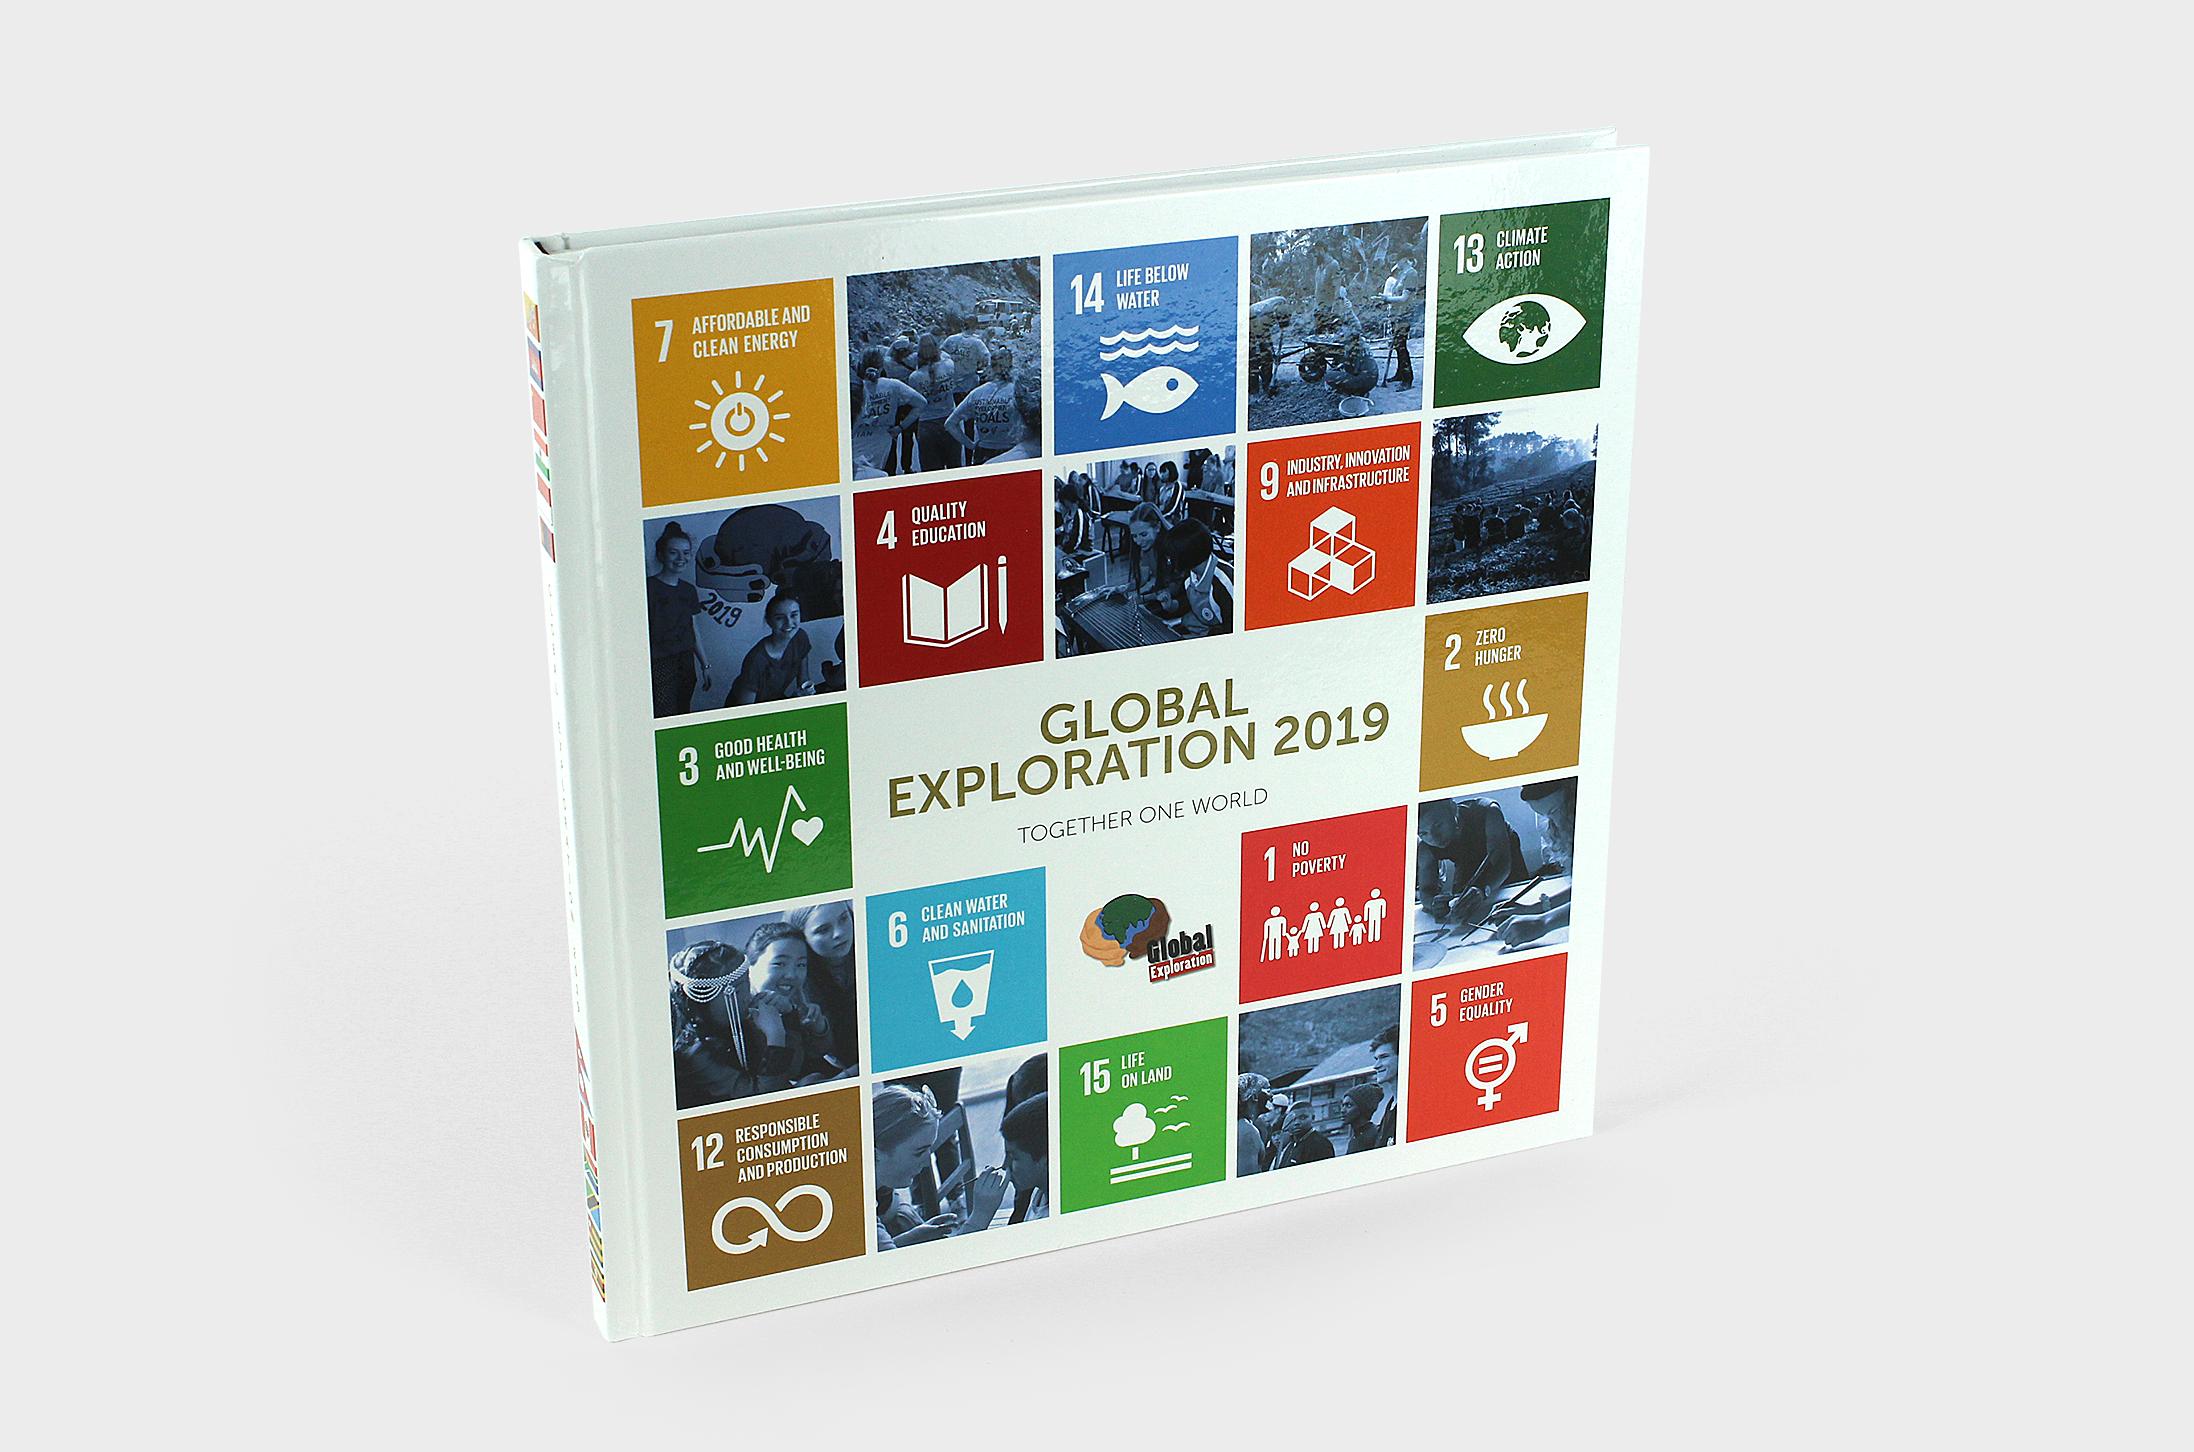 Global Exploration 2019